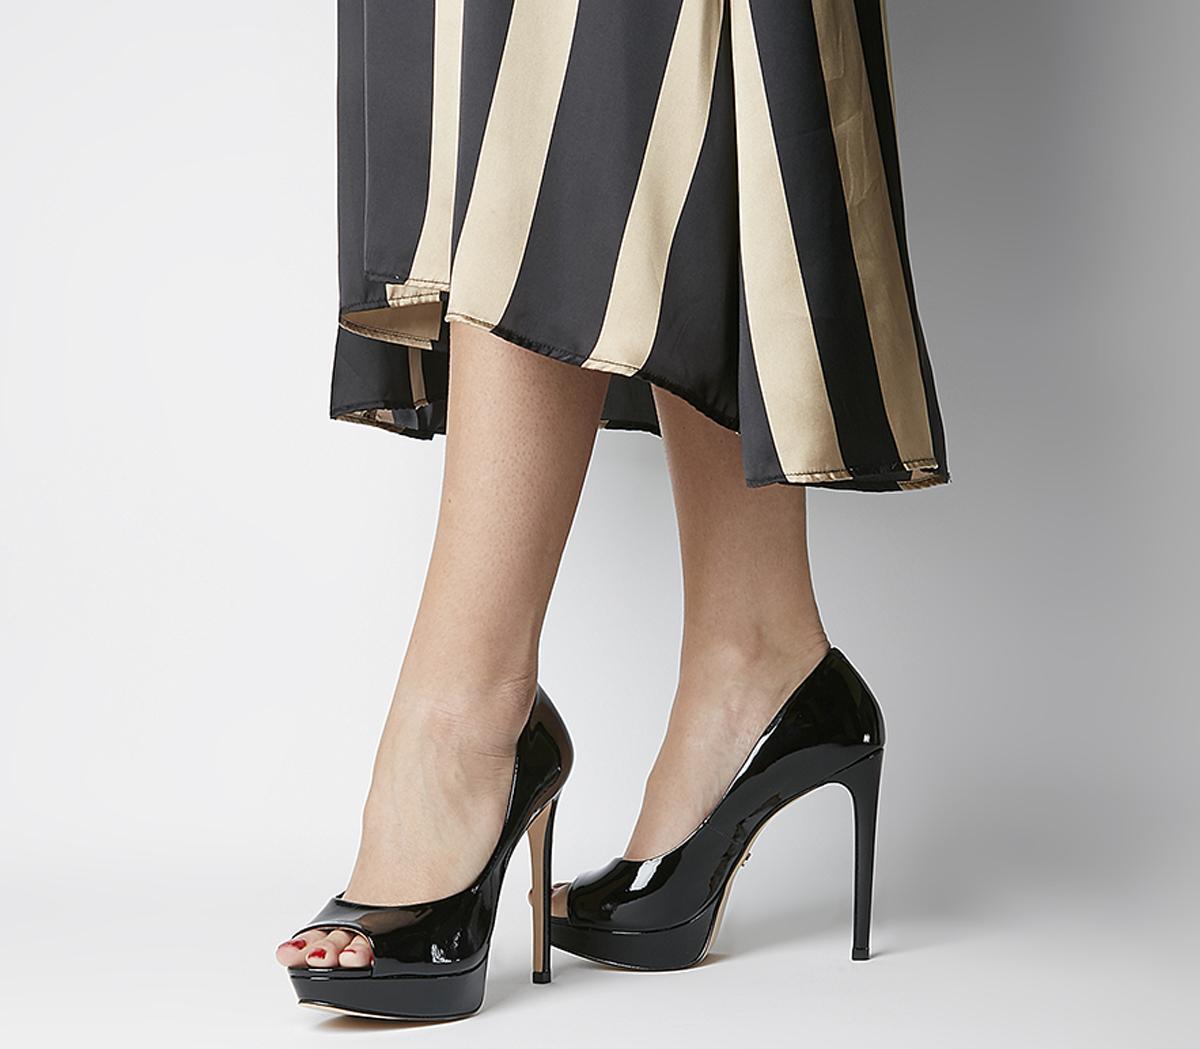 black patent high heels